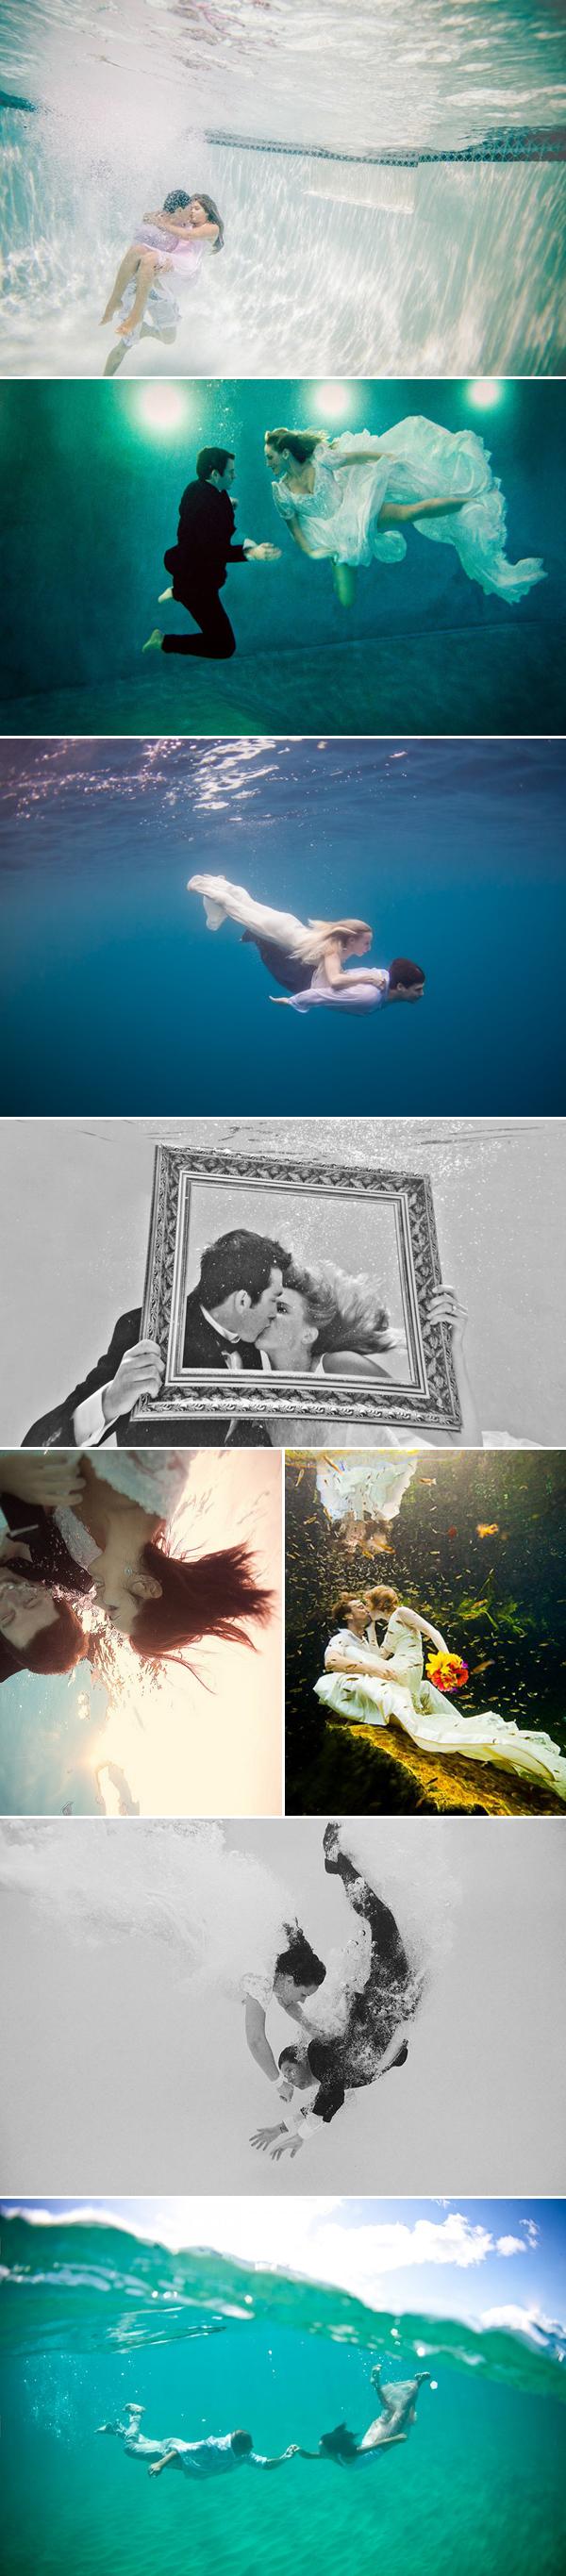 underwater03-artistic